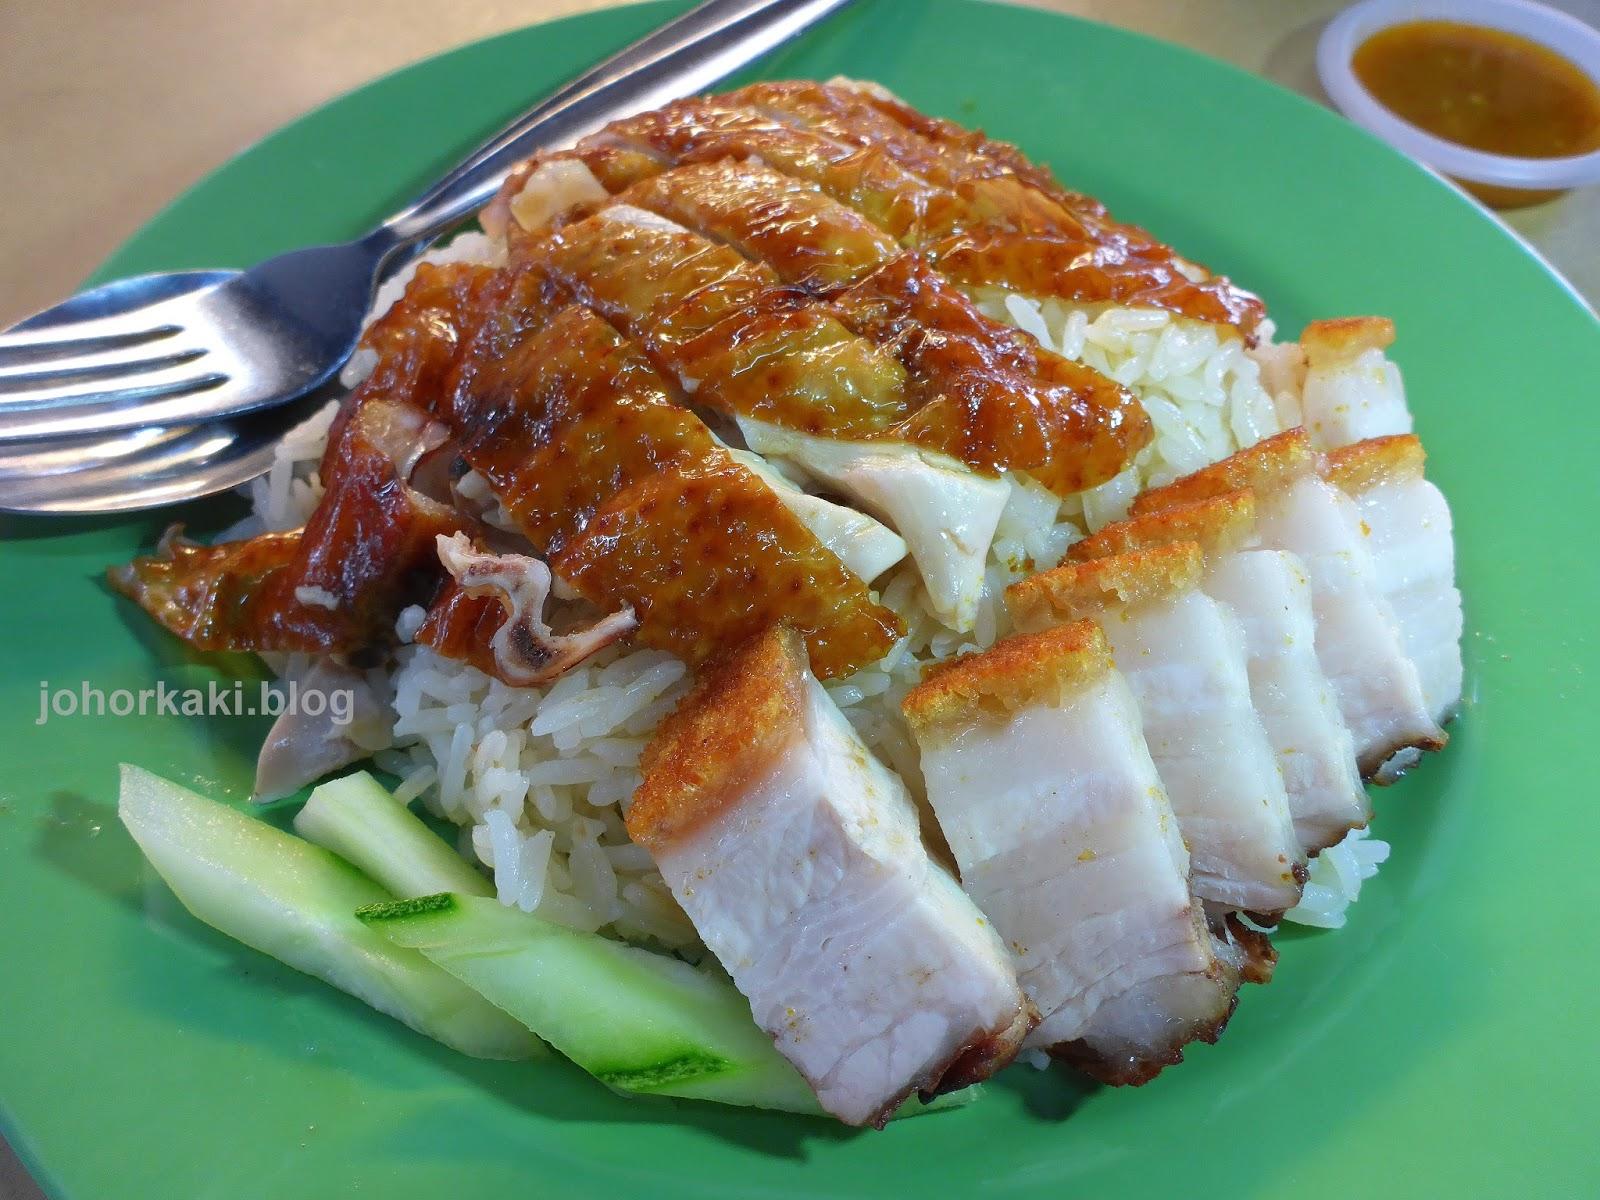 Good Food Near Ksl